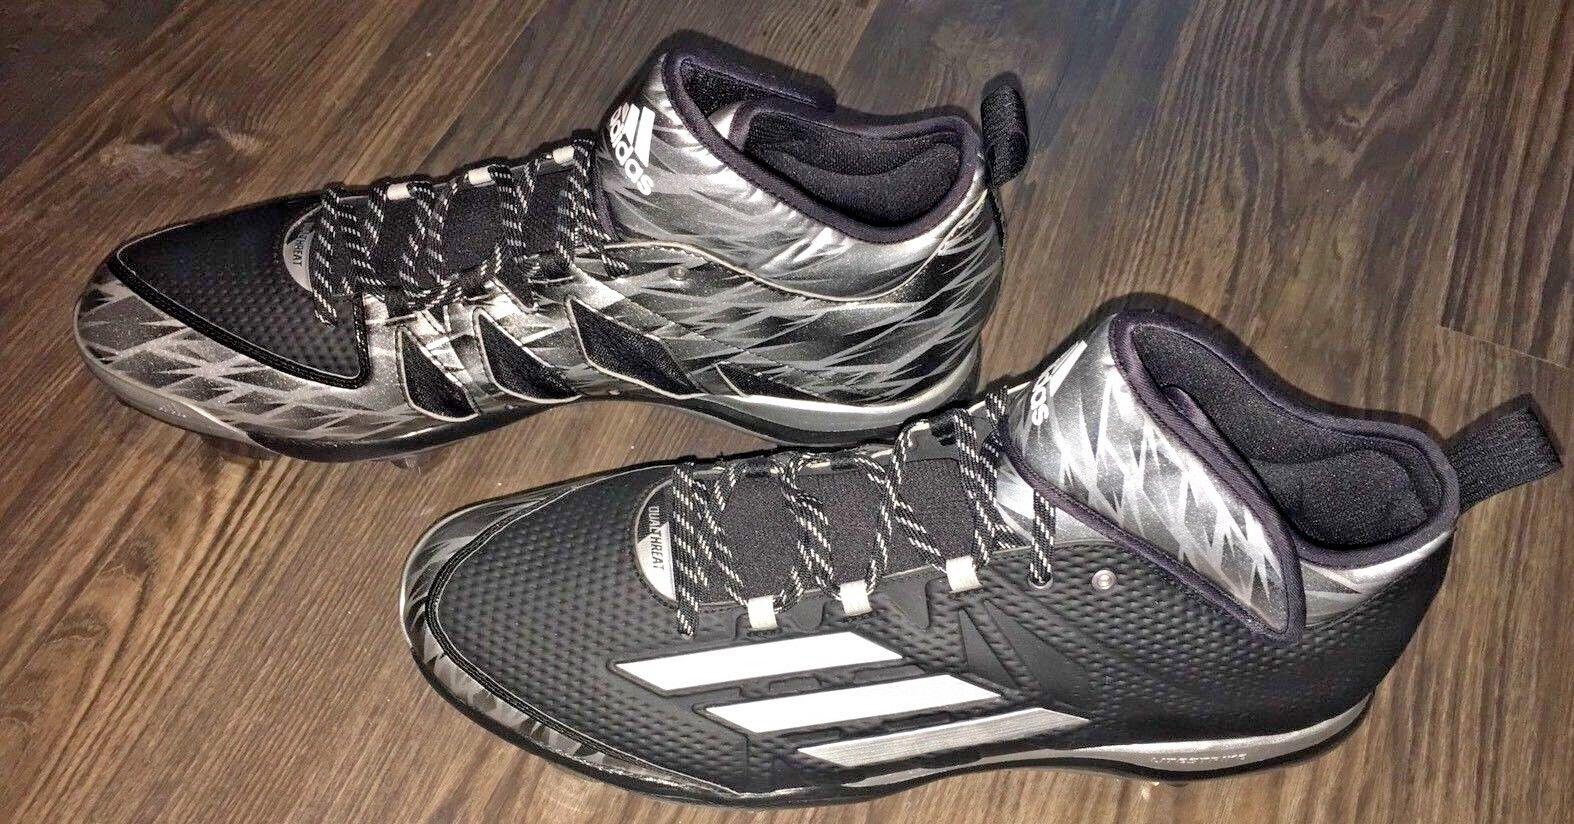 Adidas Litestrike Dual Threat Men's Baseball Cleats Size 15 D69414 MSRP  NEW